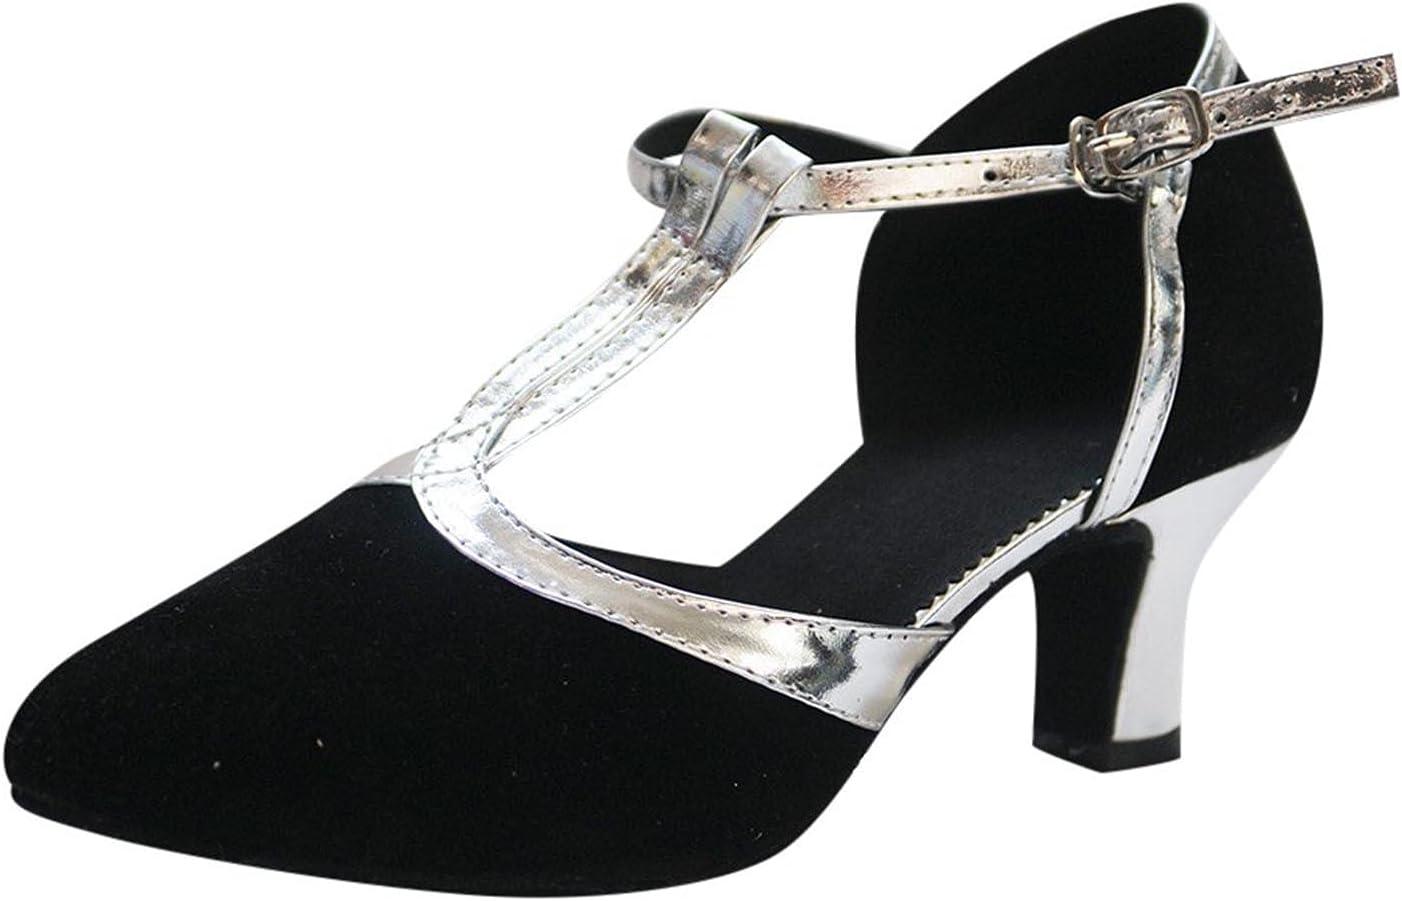 Womens Suede Latin Dance Shoes, Baotou Soft Sole Mid-Heel Square Ballroom Tango Dancing Shoes Sequins Social Dance Shoes